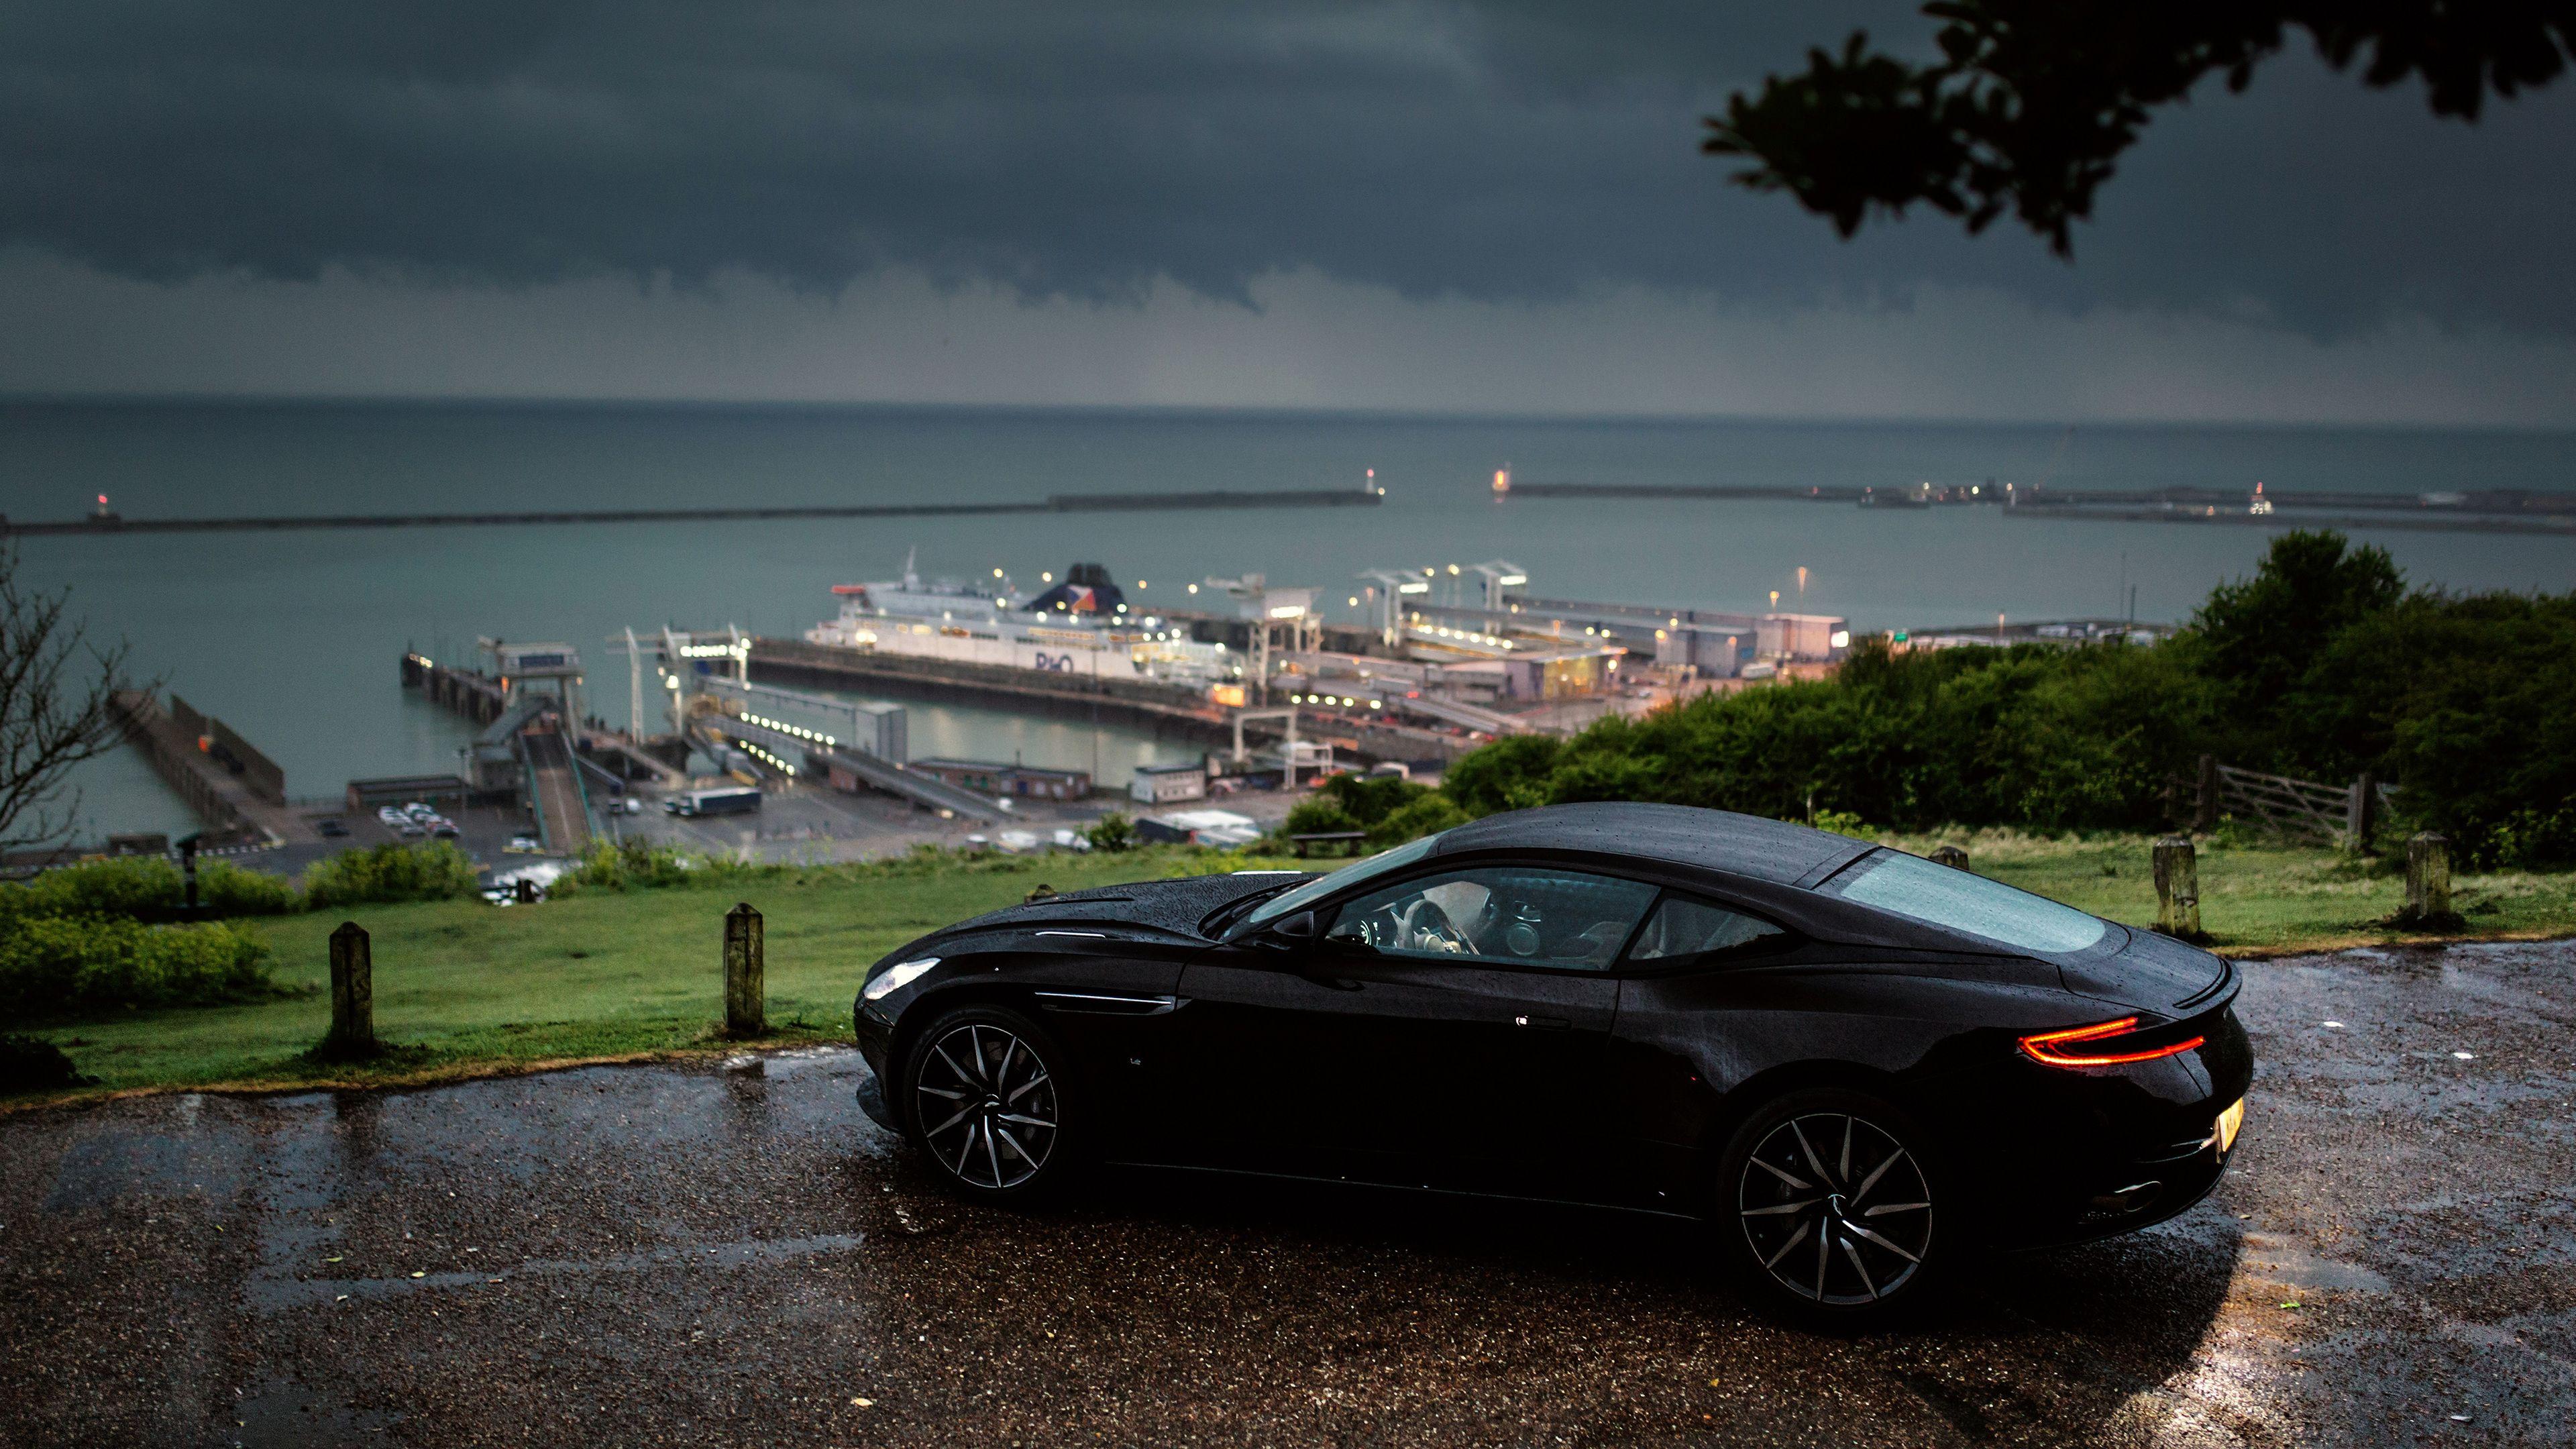 Aston Martin Db11 Rain Outside In Nature Rain Wallpapers Hd